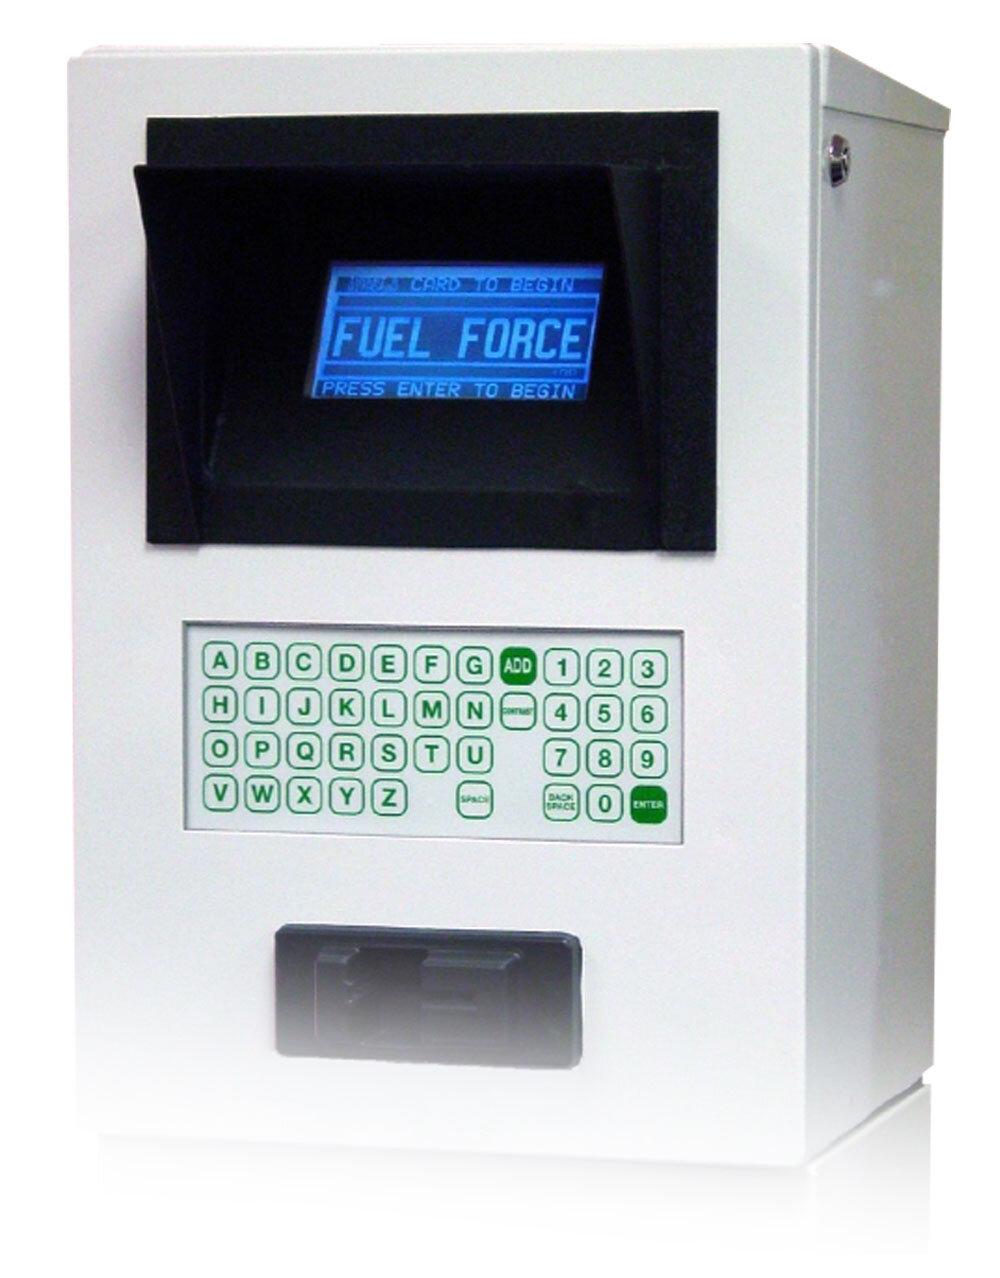 FuelForce+814-C+Product+Sheet-2004_1_0001.jpg